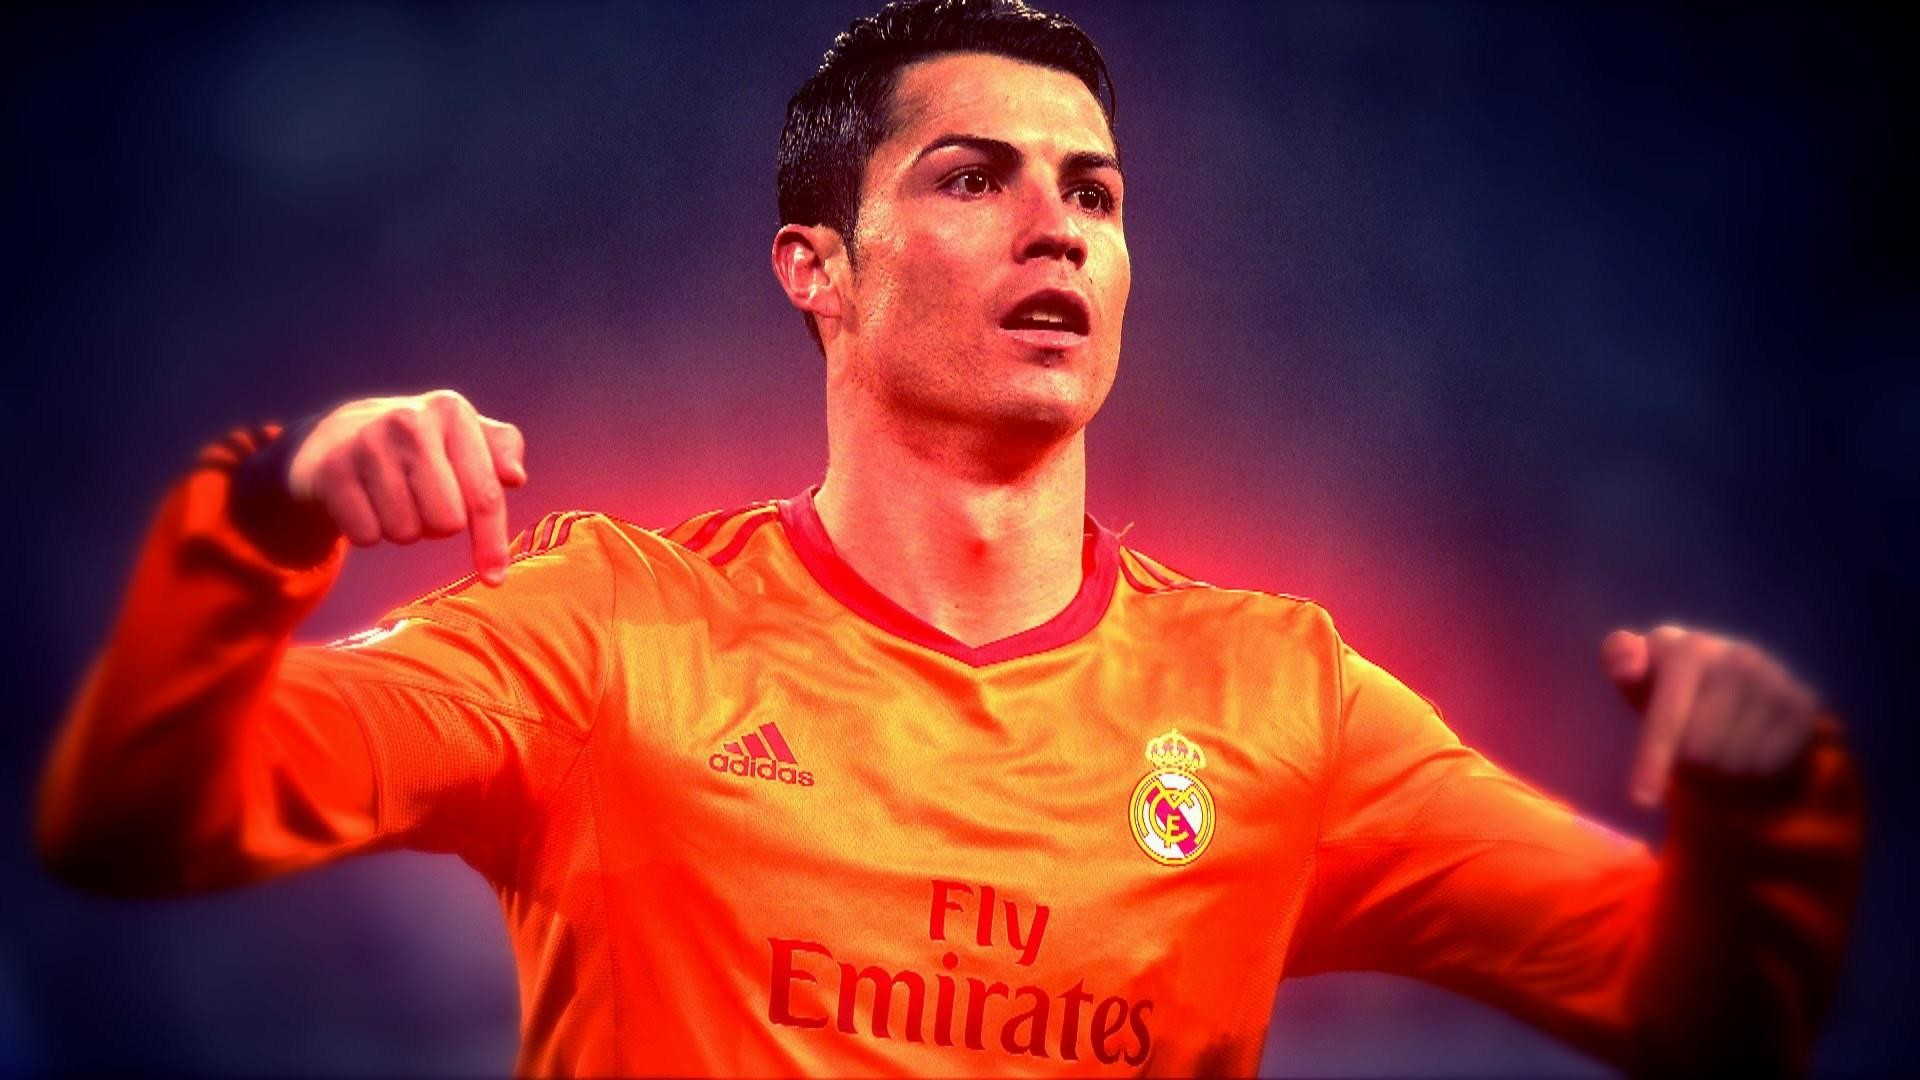 Collection-of-Ronaldo-on-HD-1080%C3%97-